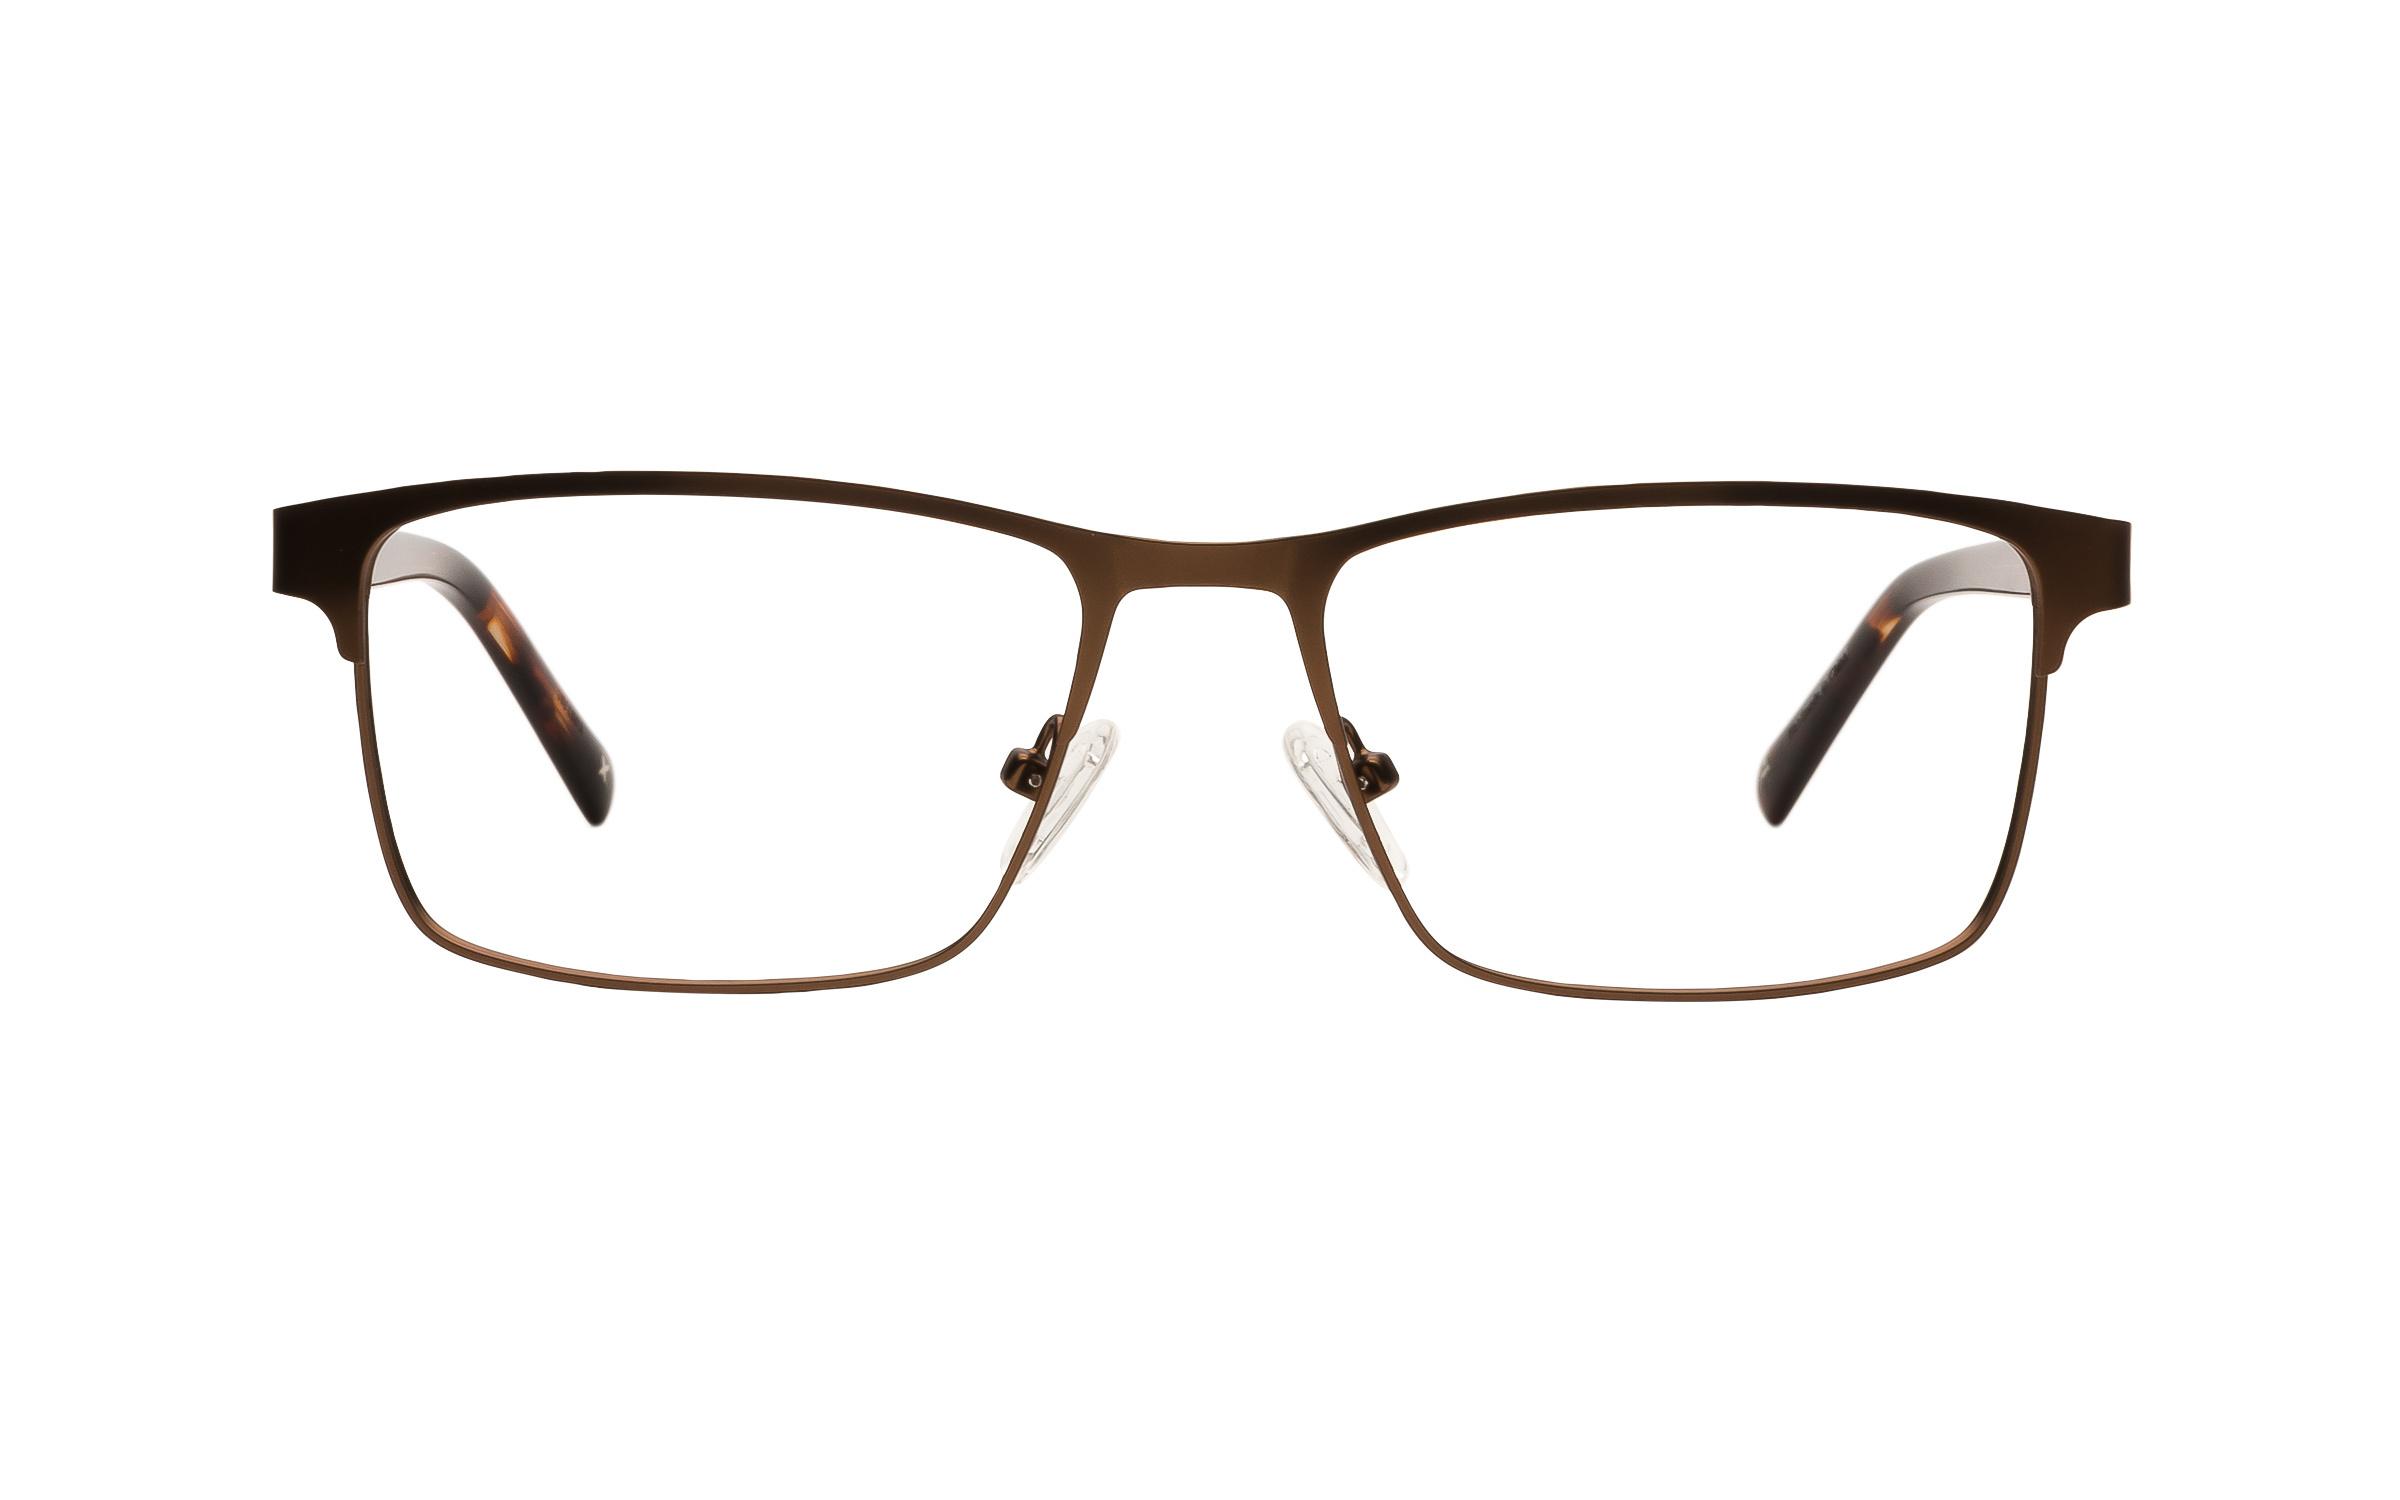 Derek_Cardigan_Mens_Glasses_Rectangular_Brown_Online_Coastal